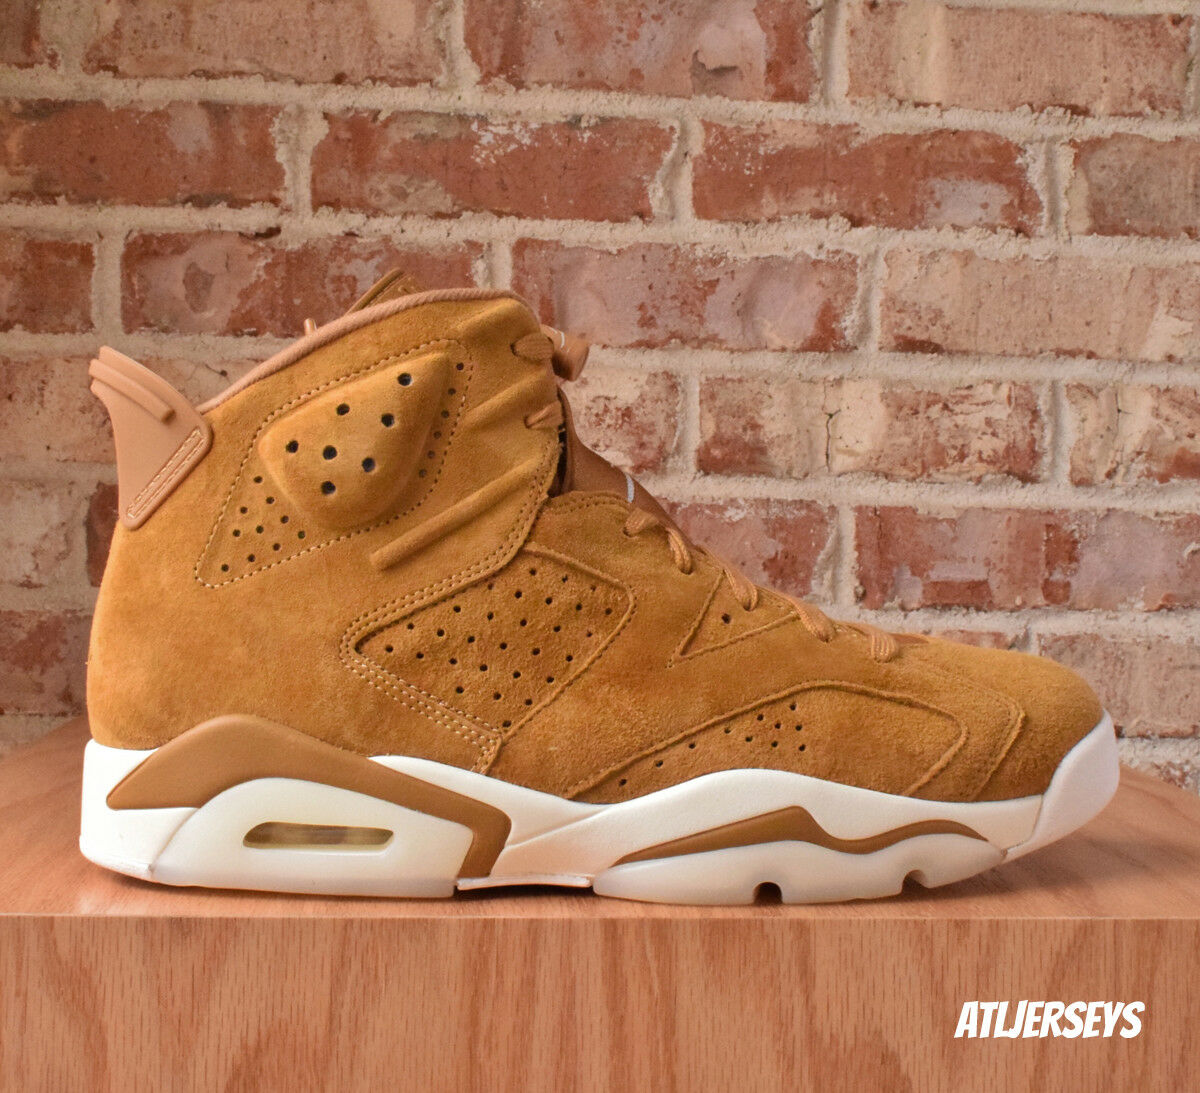 NEW DS Nike Air Jordan 6 VI Retro Wheat Golden Harvest 384664-705 Comfortable Wild casual shoes